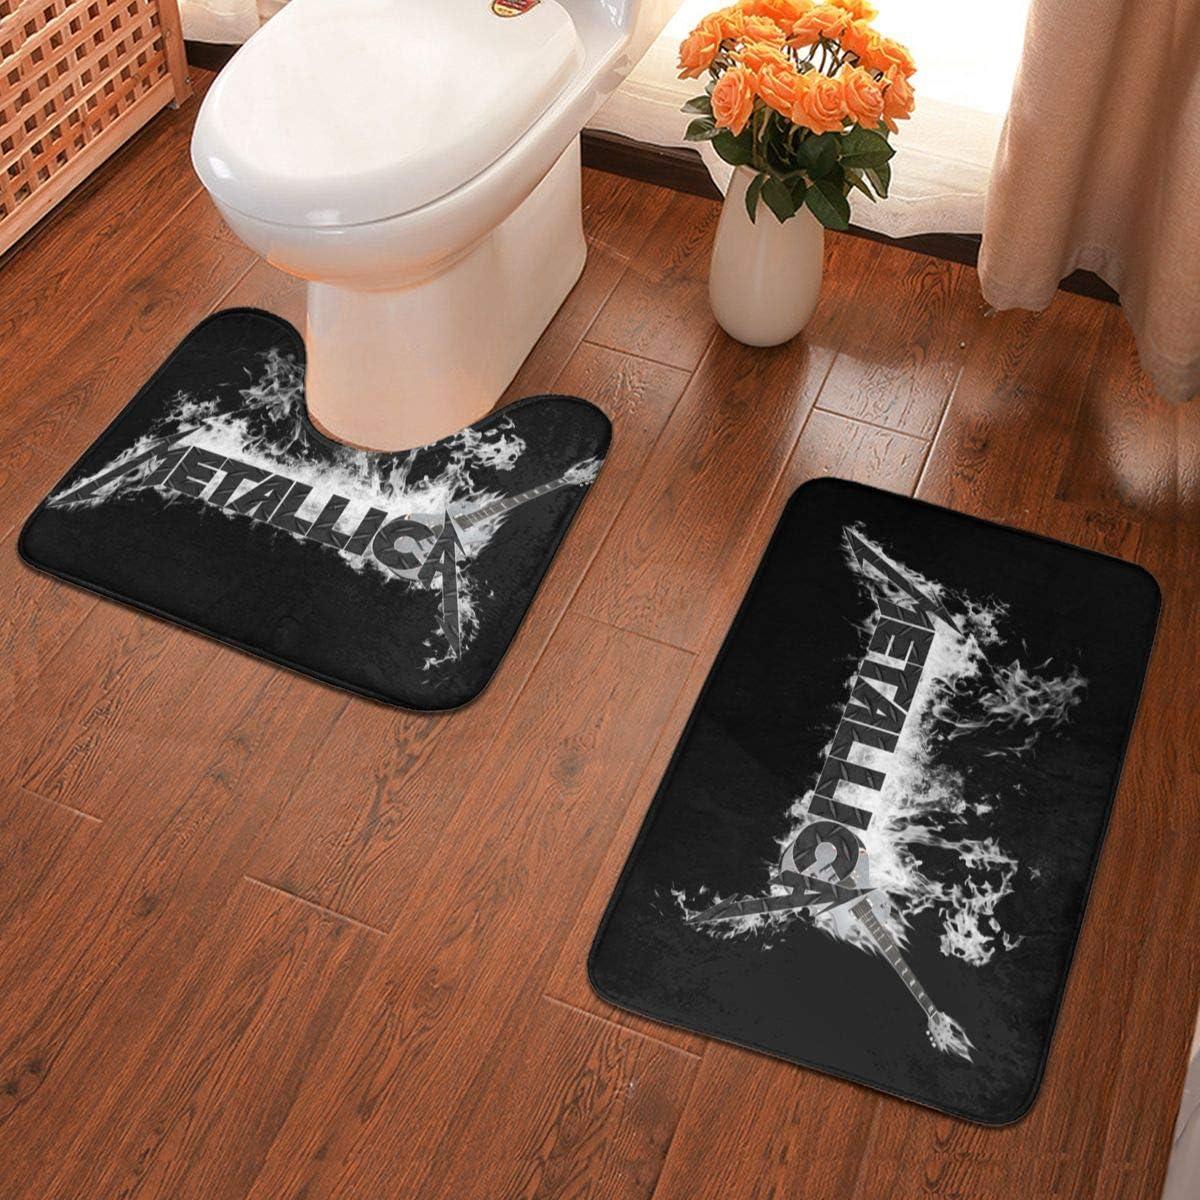 NA Bathroom Antiskid Pad Metallica Durable Water Absorption and Anti Skid Bathroom Antiskid Pad Two-Piece